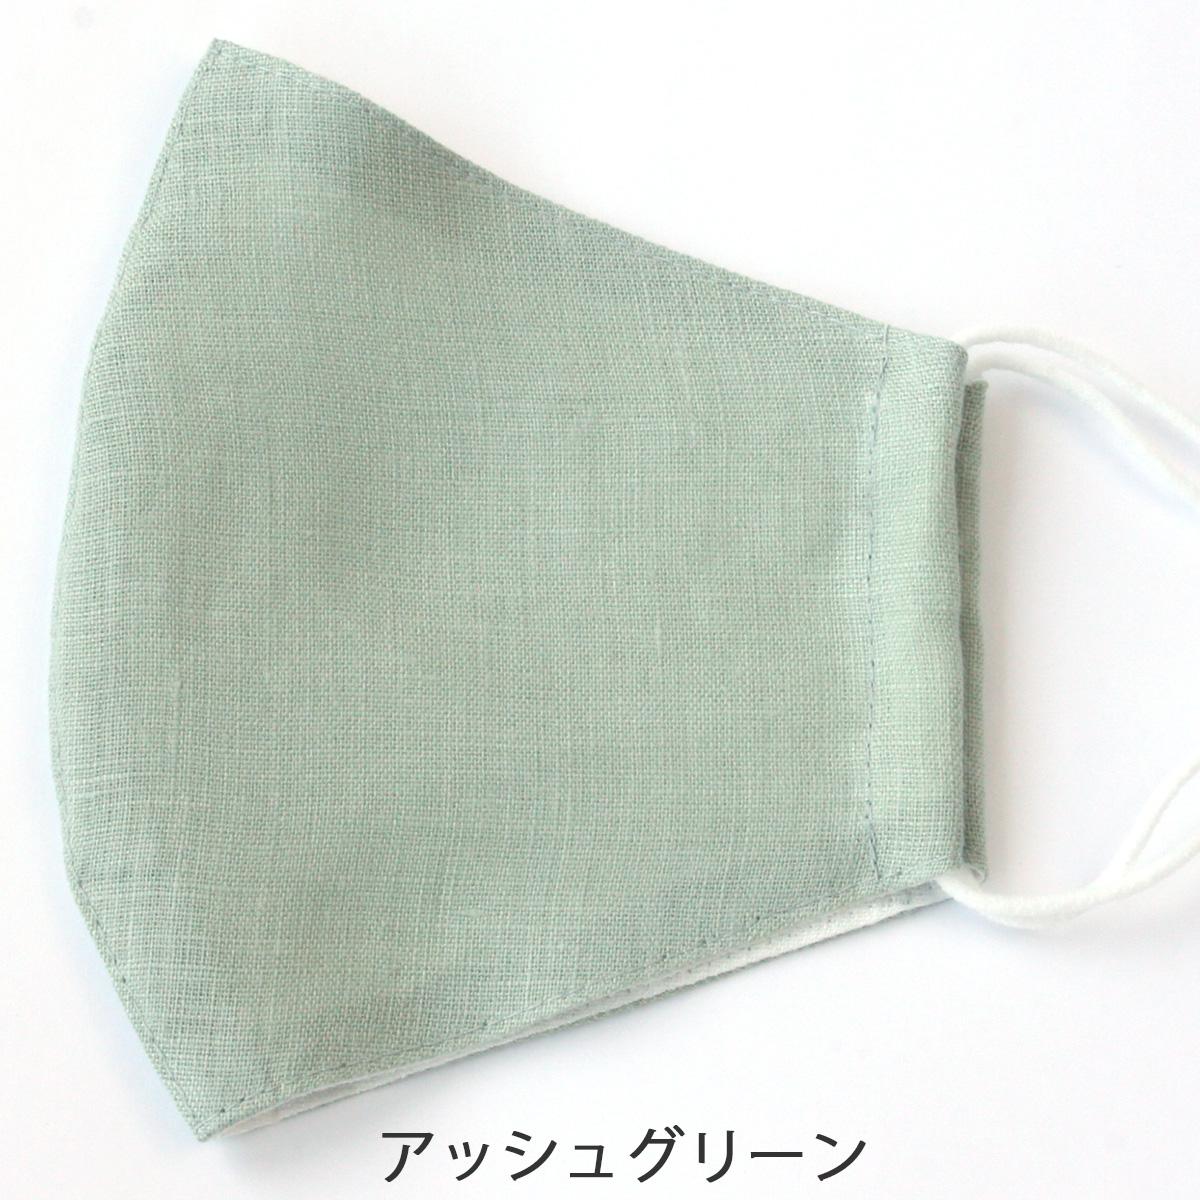 Cadeauya【リネン立体マスク 】レディース メンズ ワンサイズ 日本製 4色展開